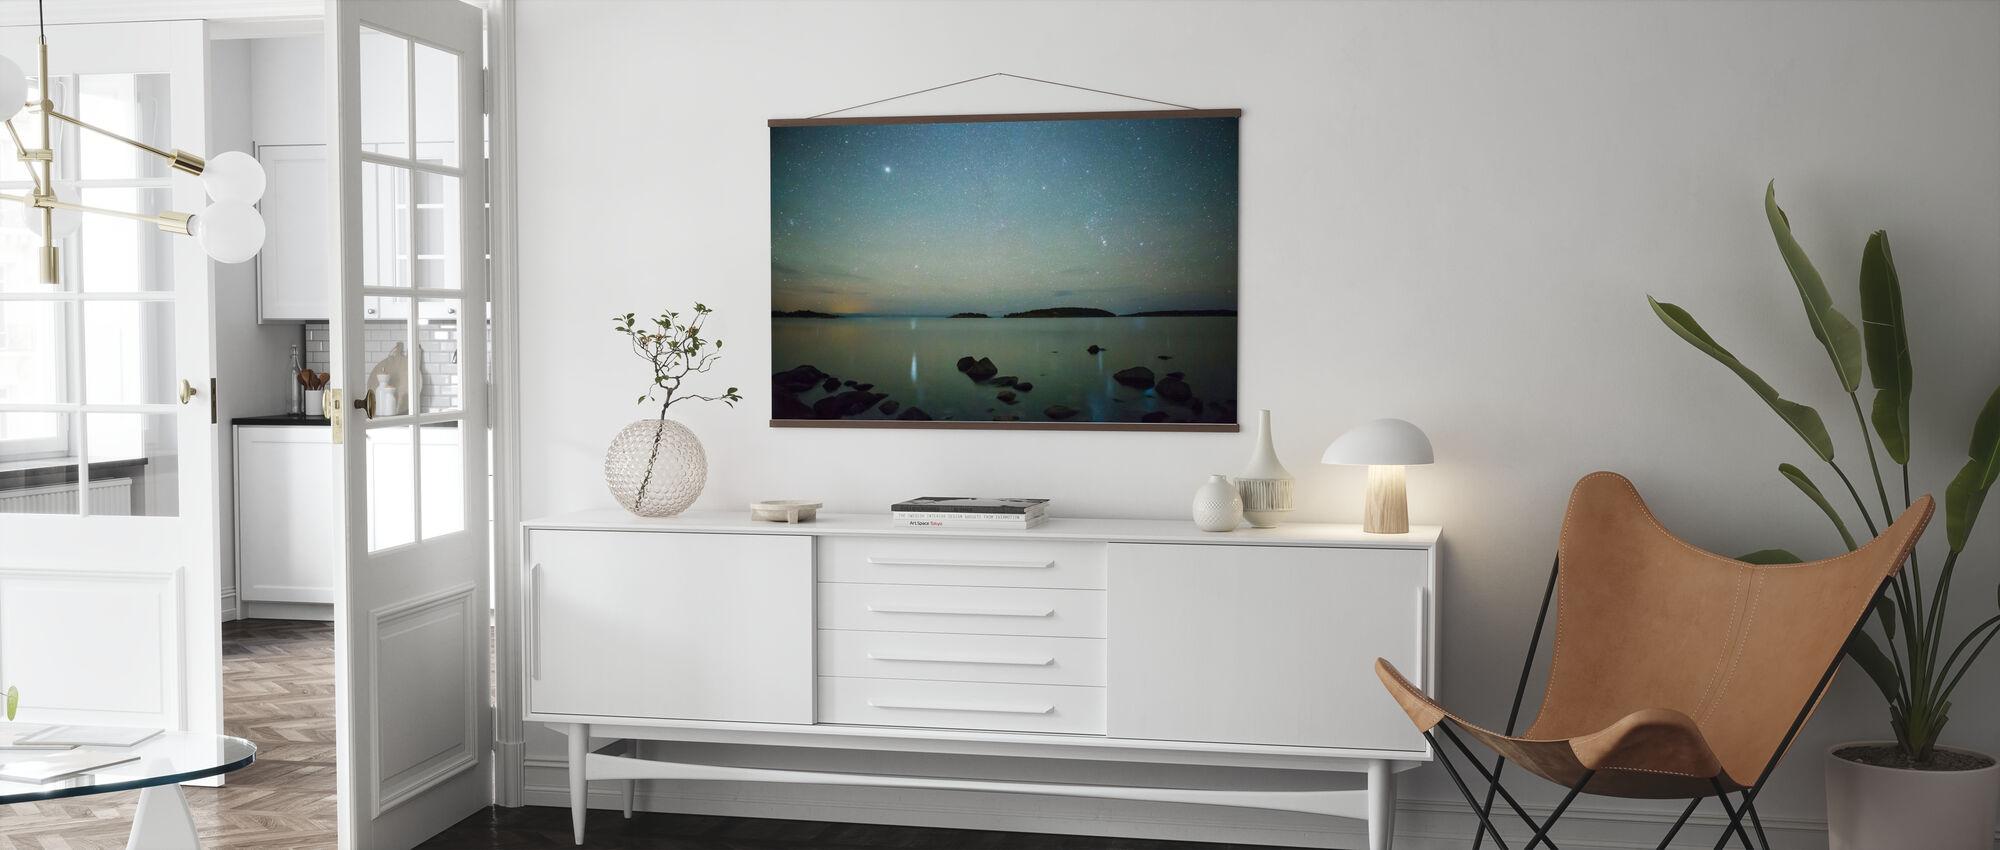 Starry Sky over Juniskär, Sweden - Poster - Living Room